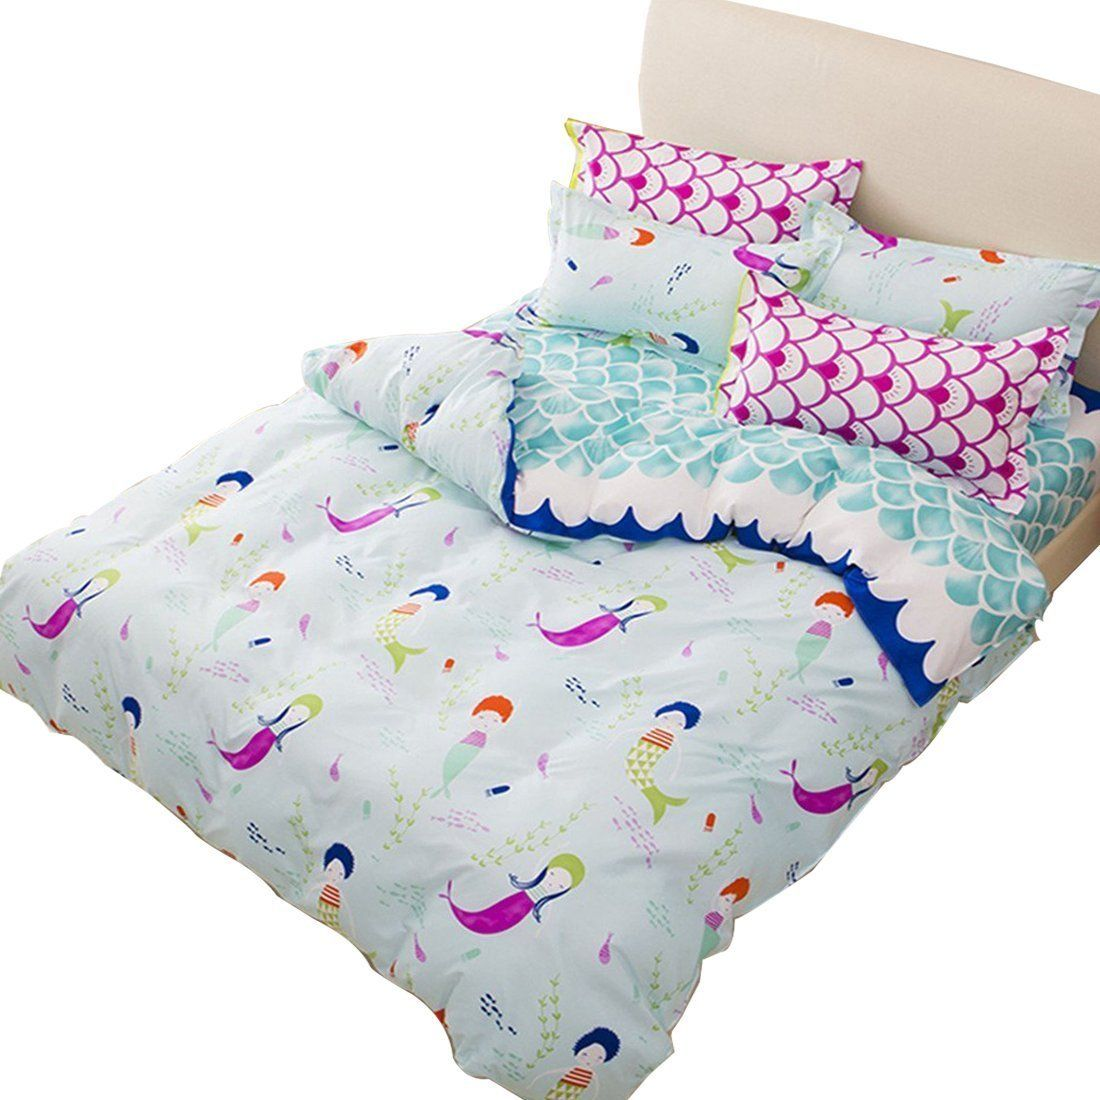 sookie duvet cover set with 2 pillow shams blue duvet